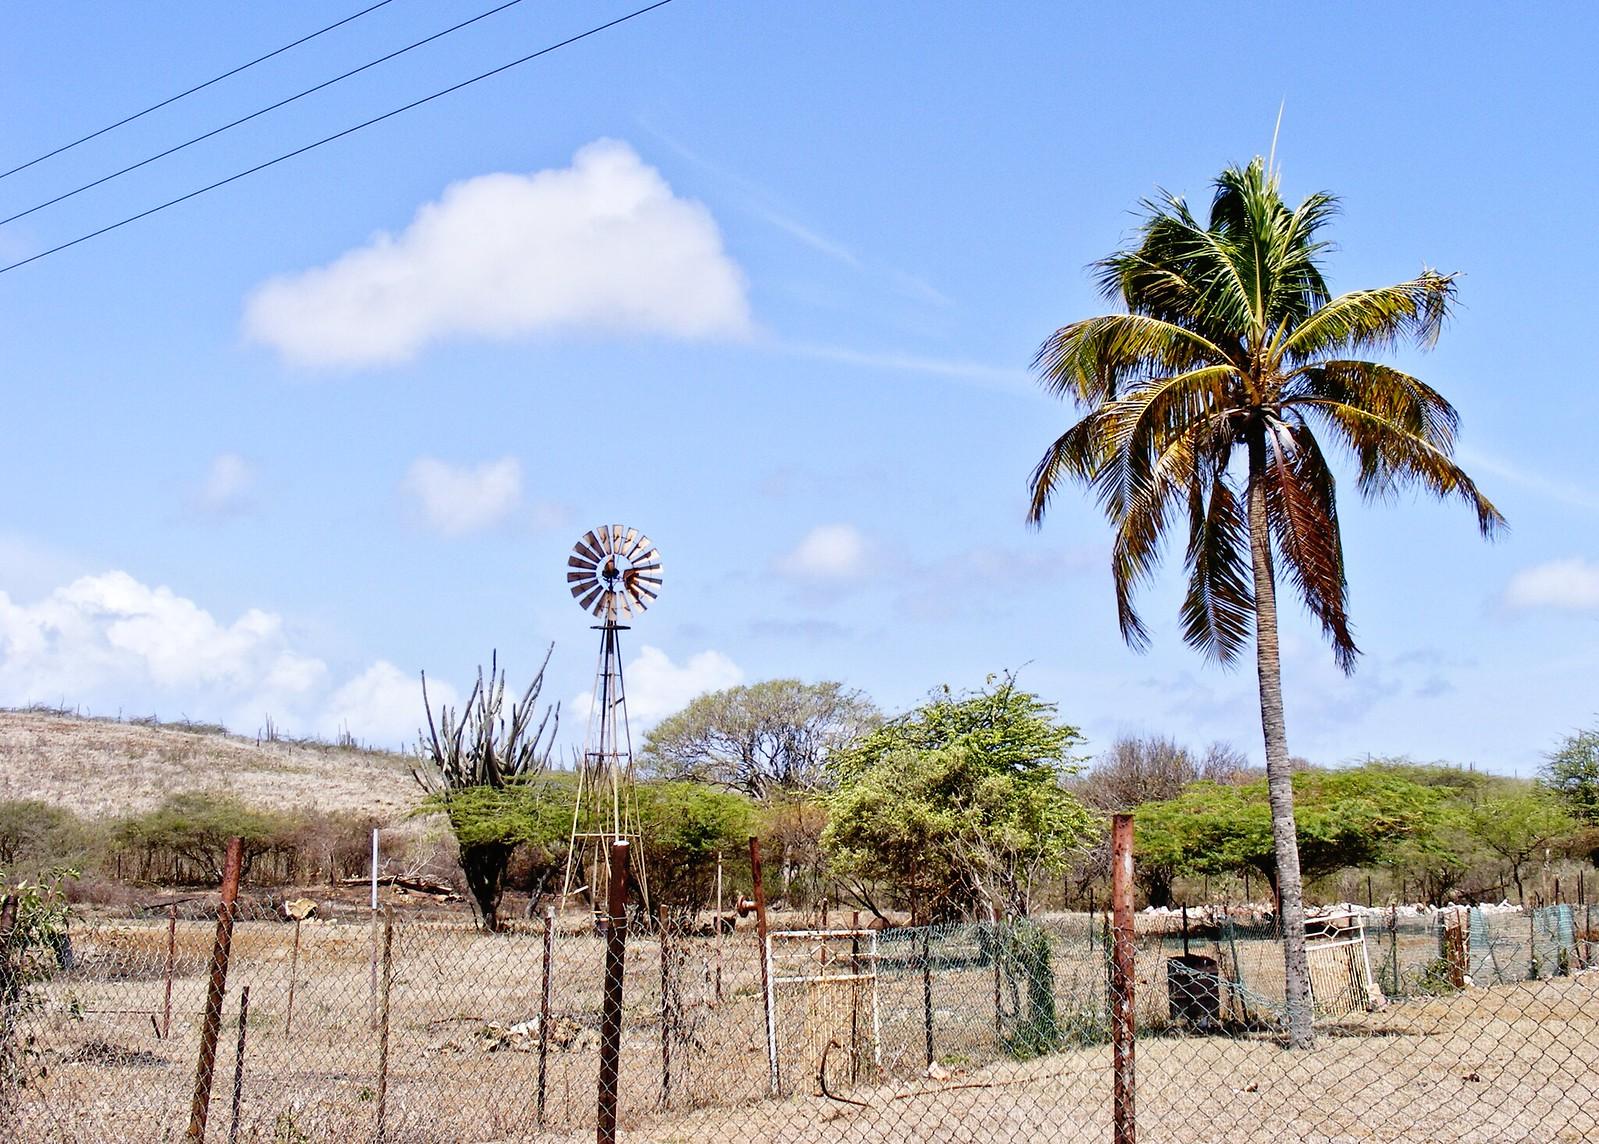 The Kunuku, or countryside of Curaçao.